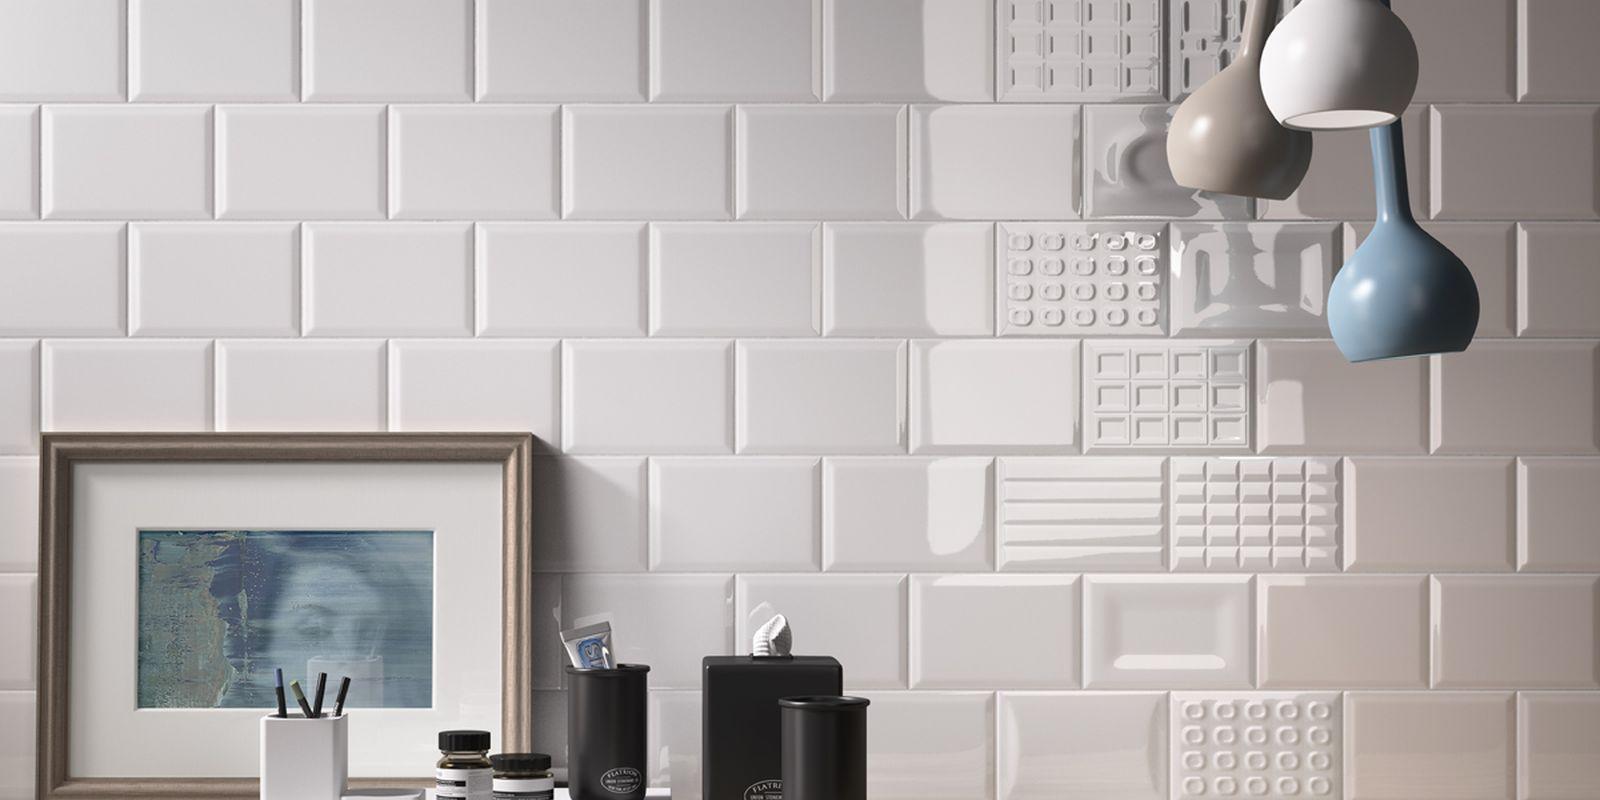 Piastrelle Cento Per Cento Bagno Moderno Ceramica